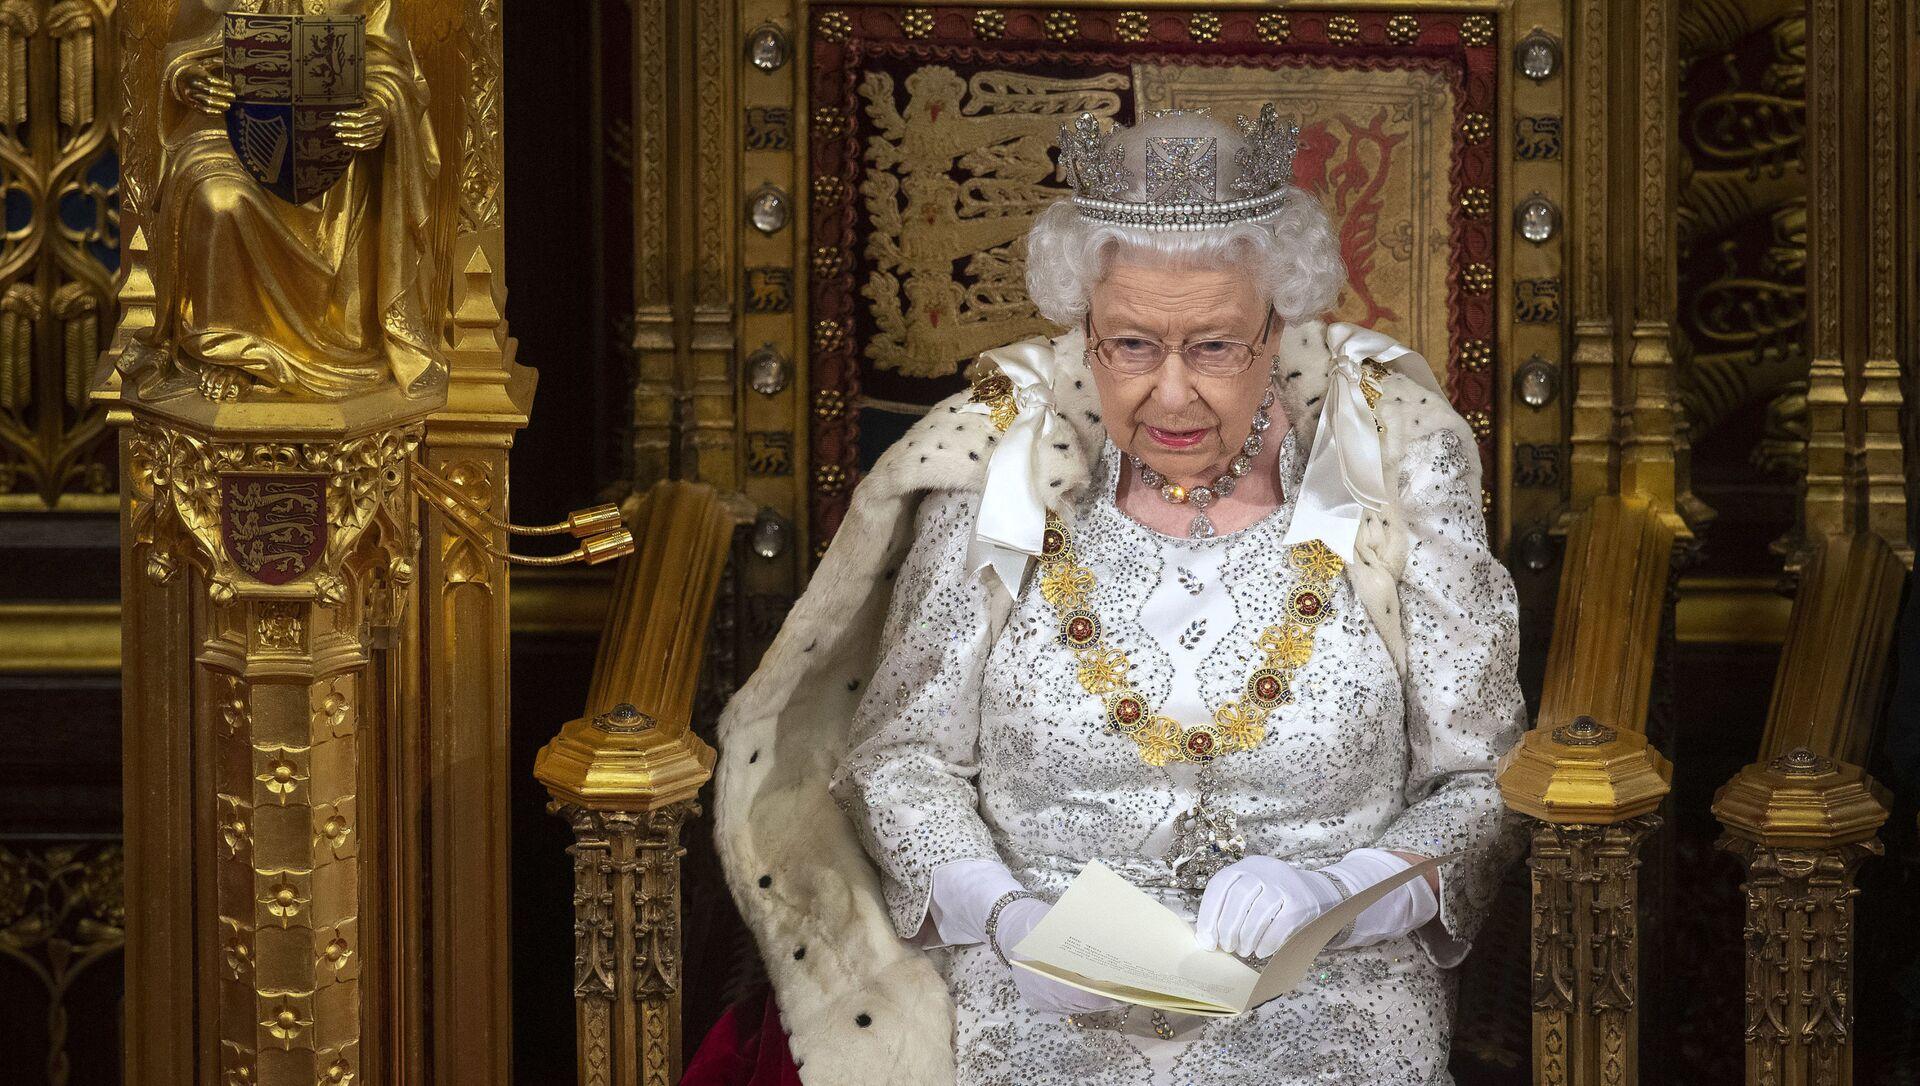 Королева Великобритании Елизавета II во время церемонии открытия парламента - Sputnik Азербайджан, 1920, 20.09.2021